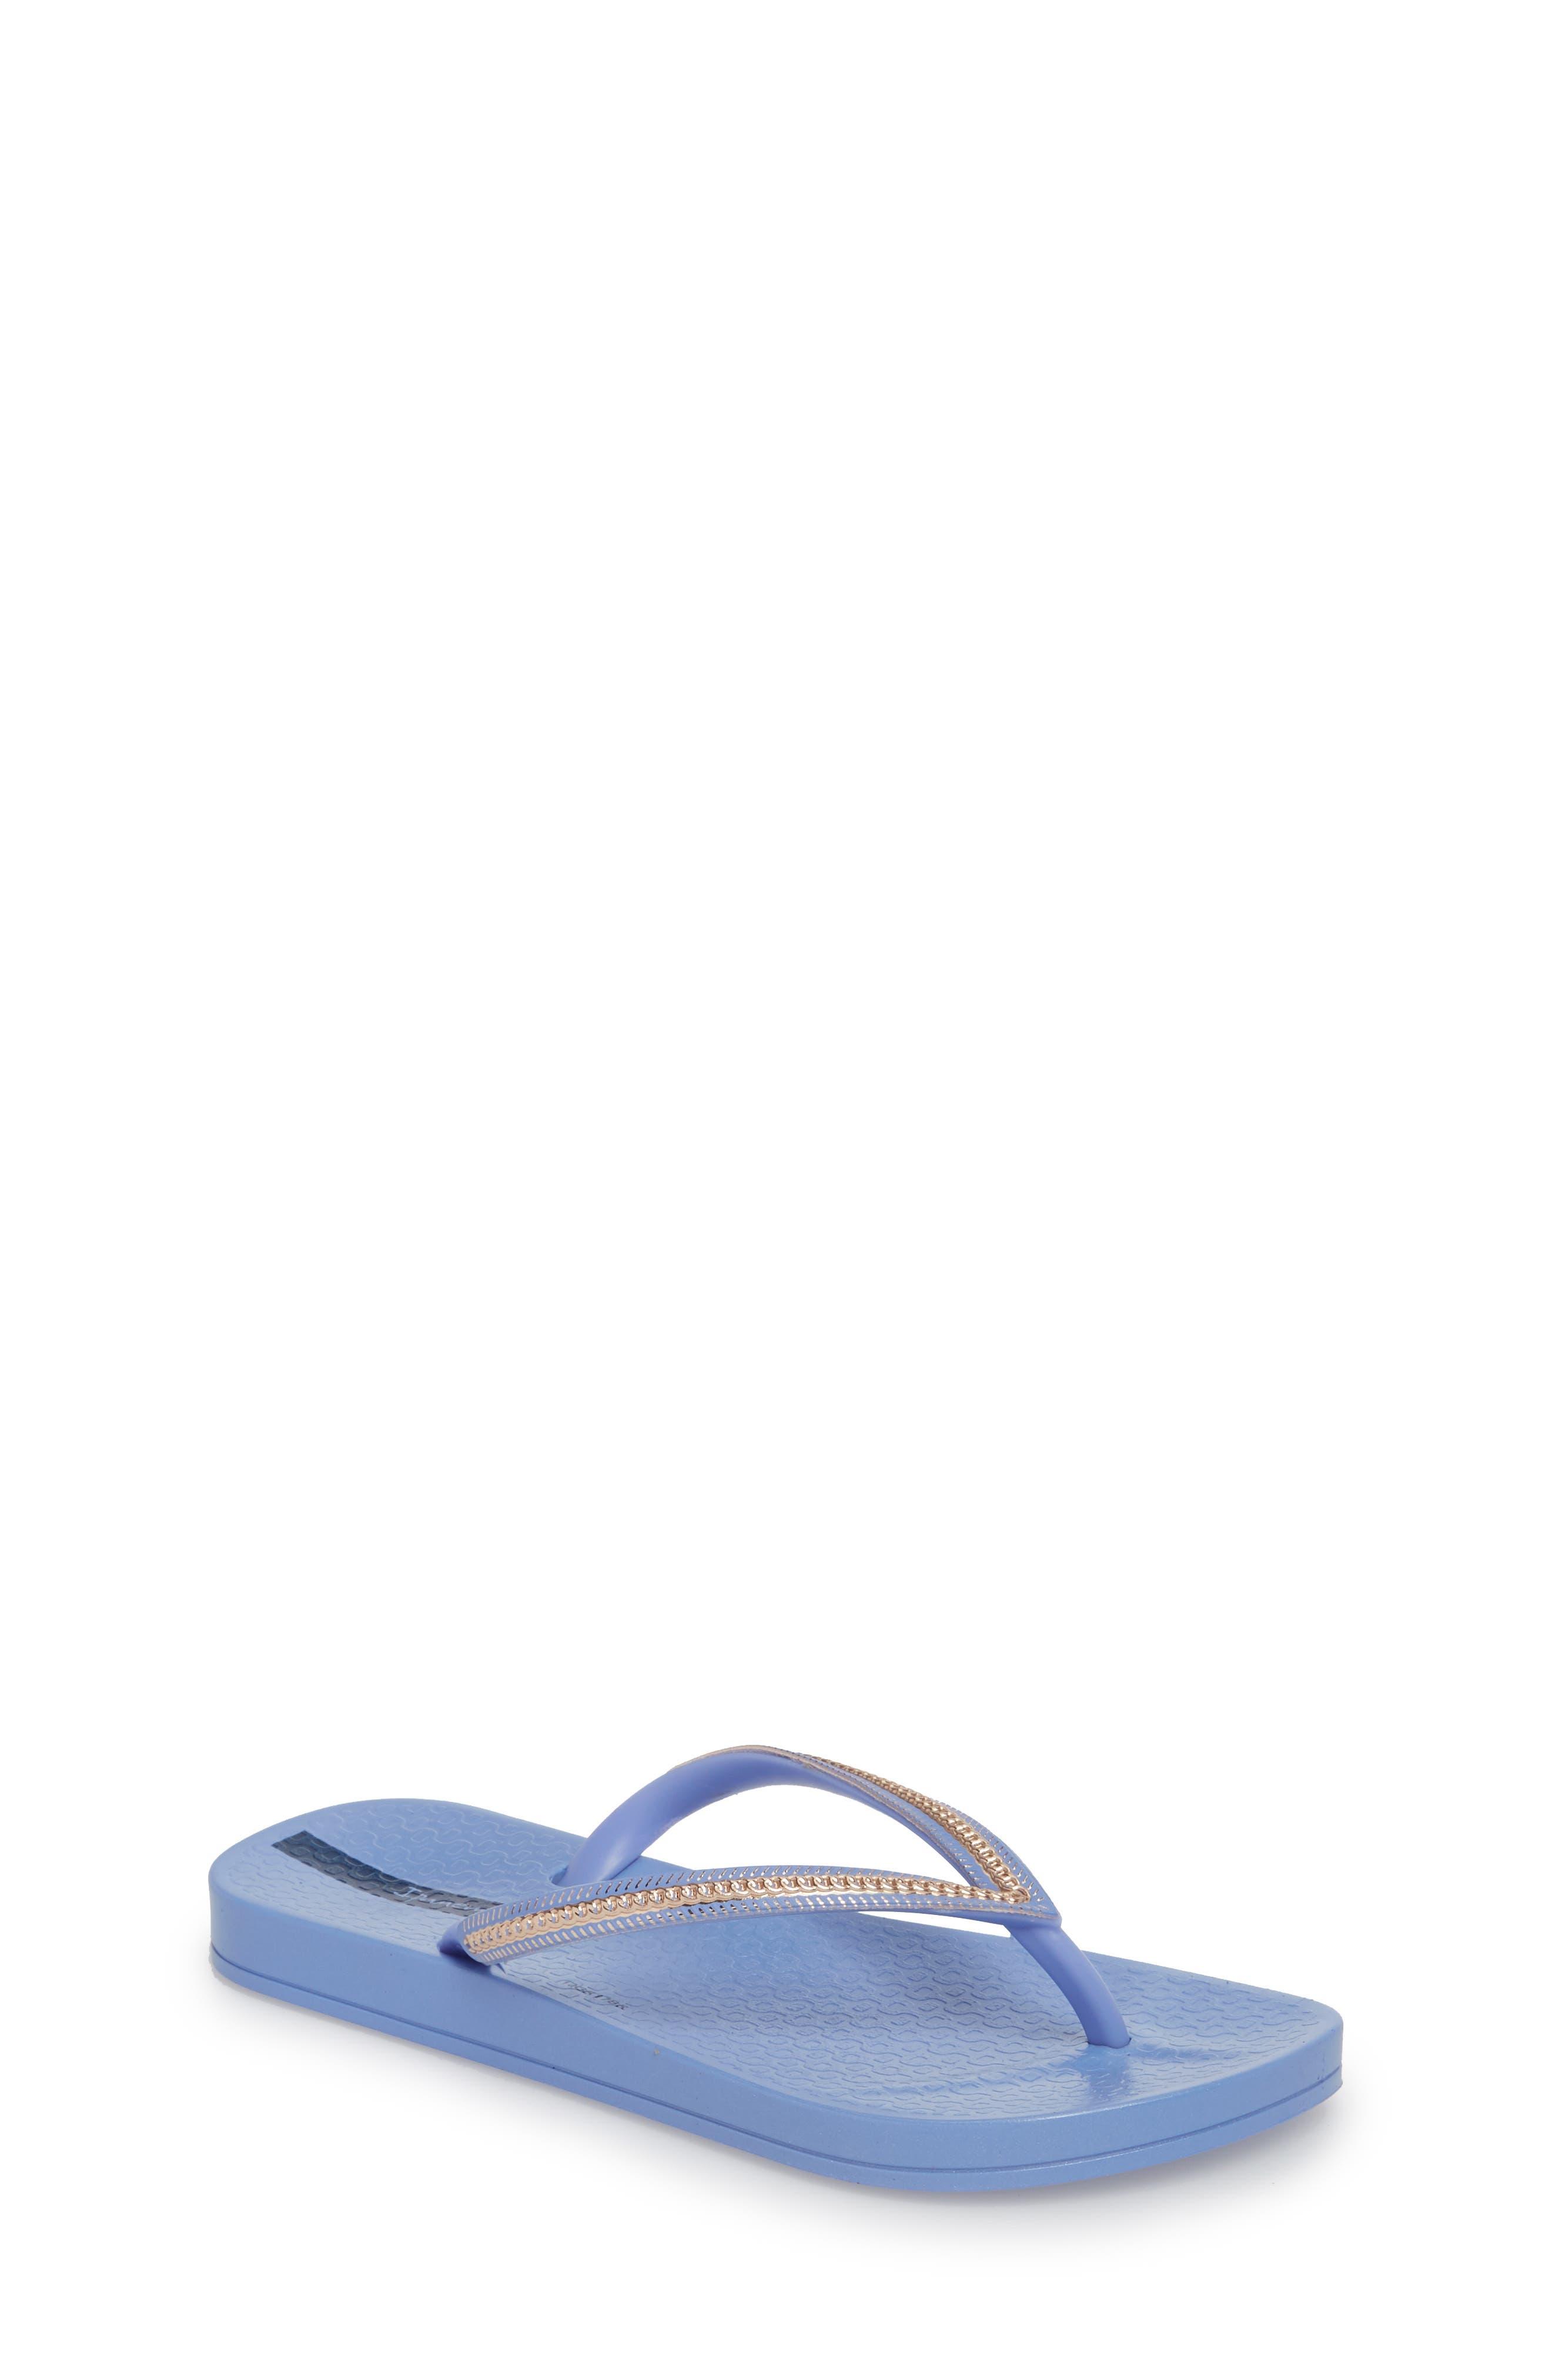 Ana Metallic Flip Flop,                         Main,                         color, 500